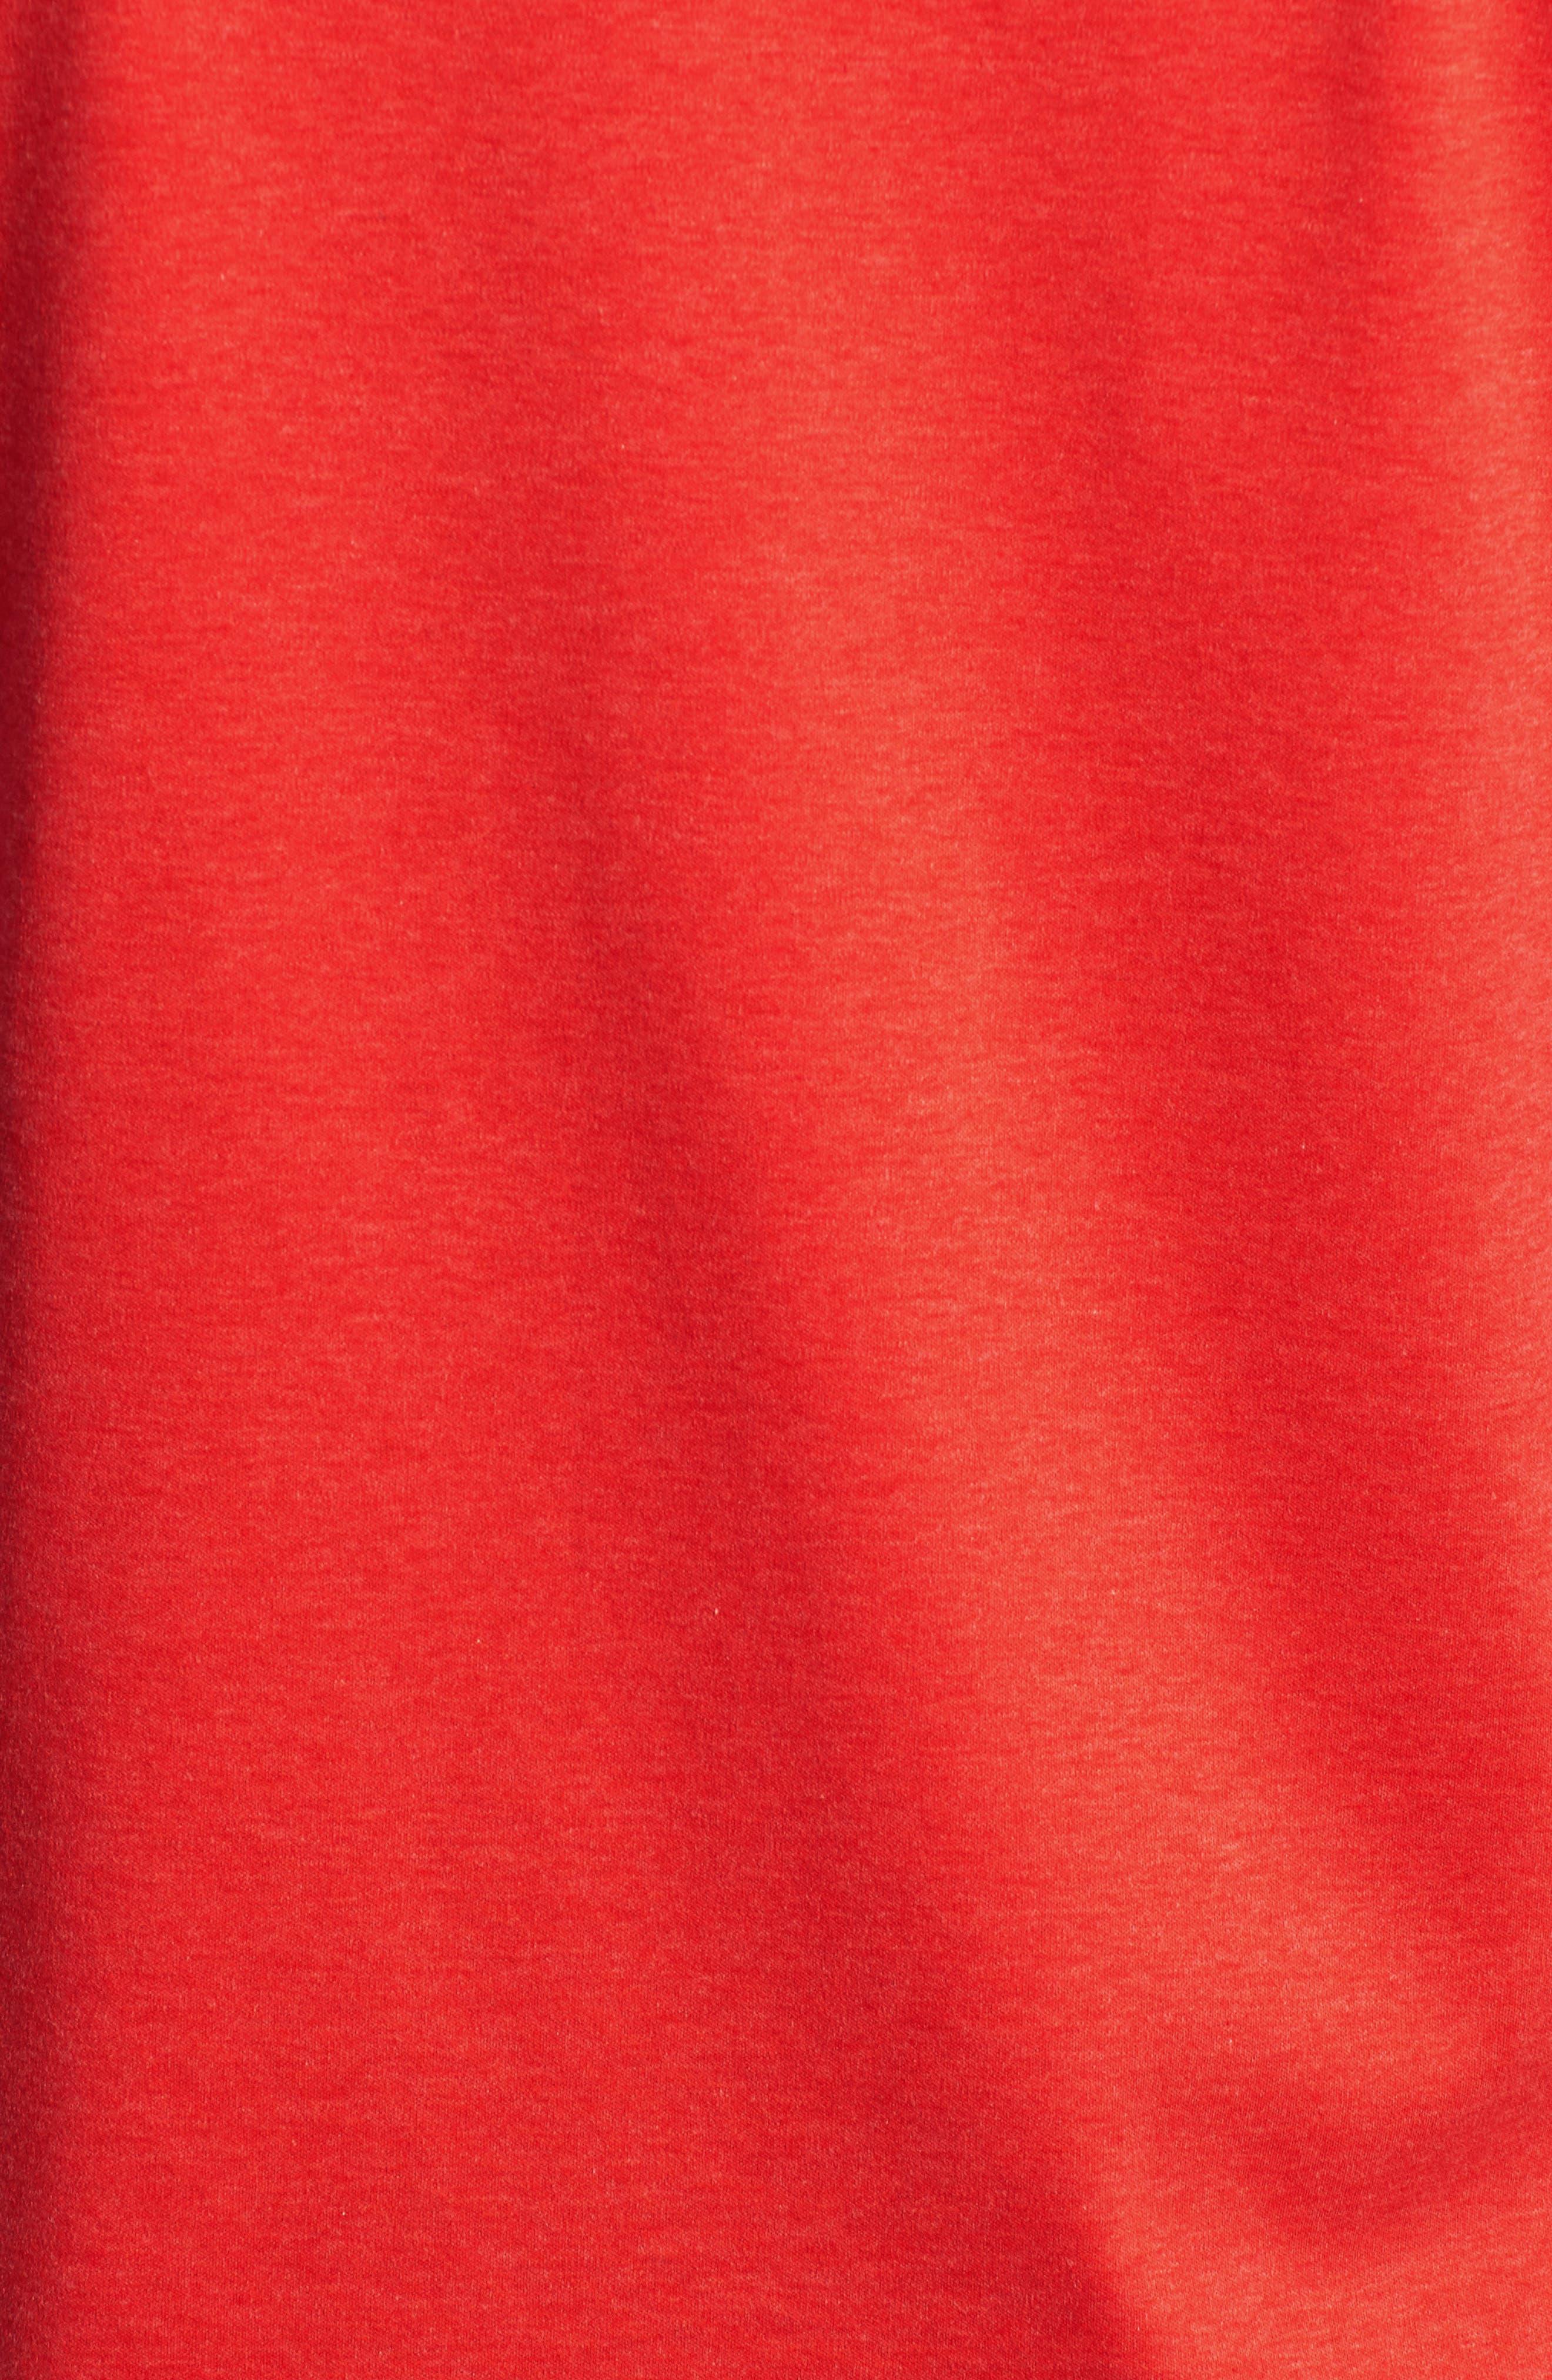 Trim Fit Heather Knit Sport Shirt,                             Alternate thumbnail 5, color,                             Cherry